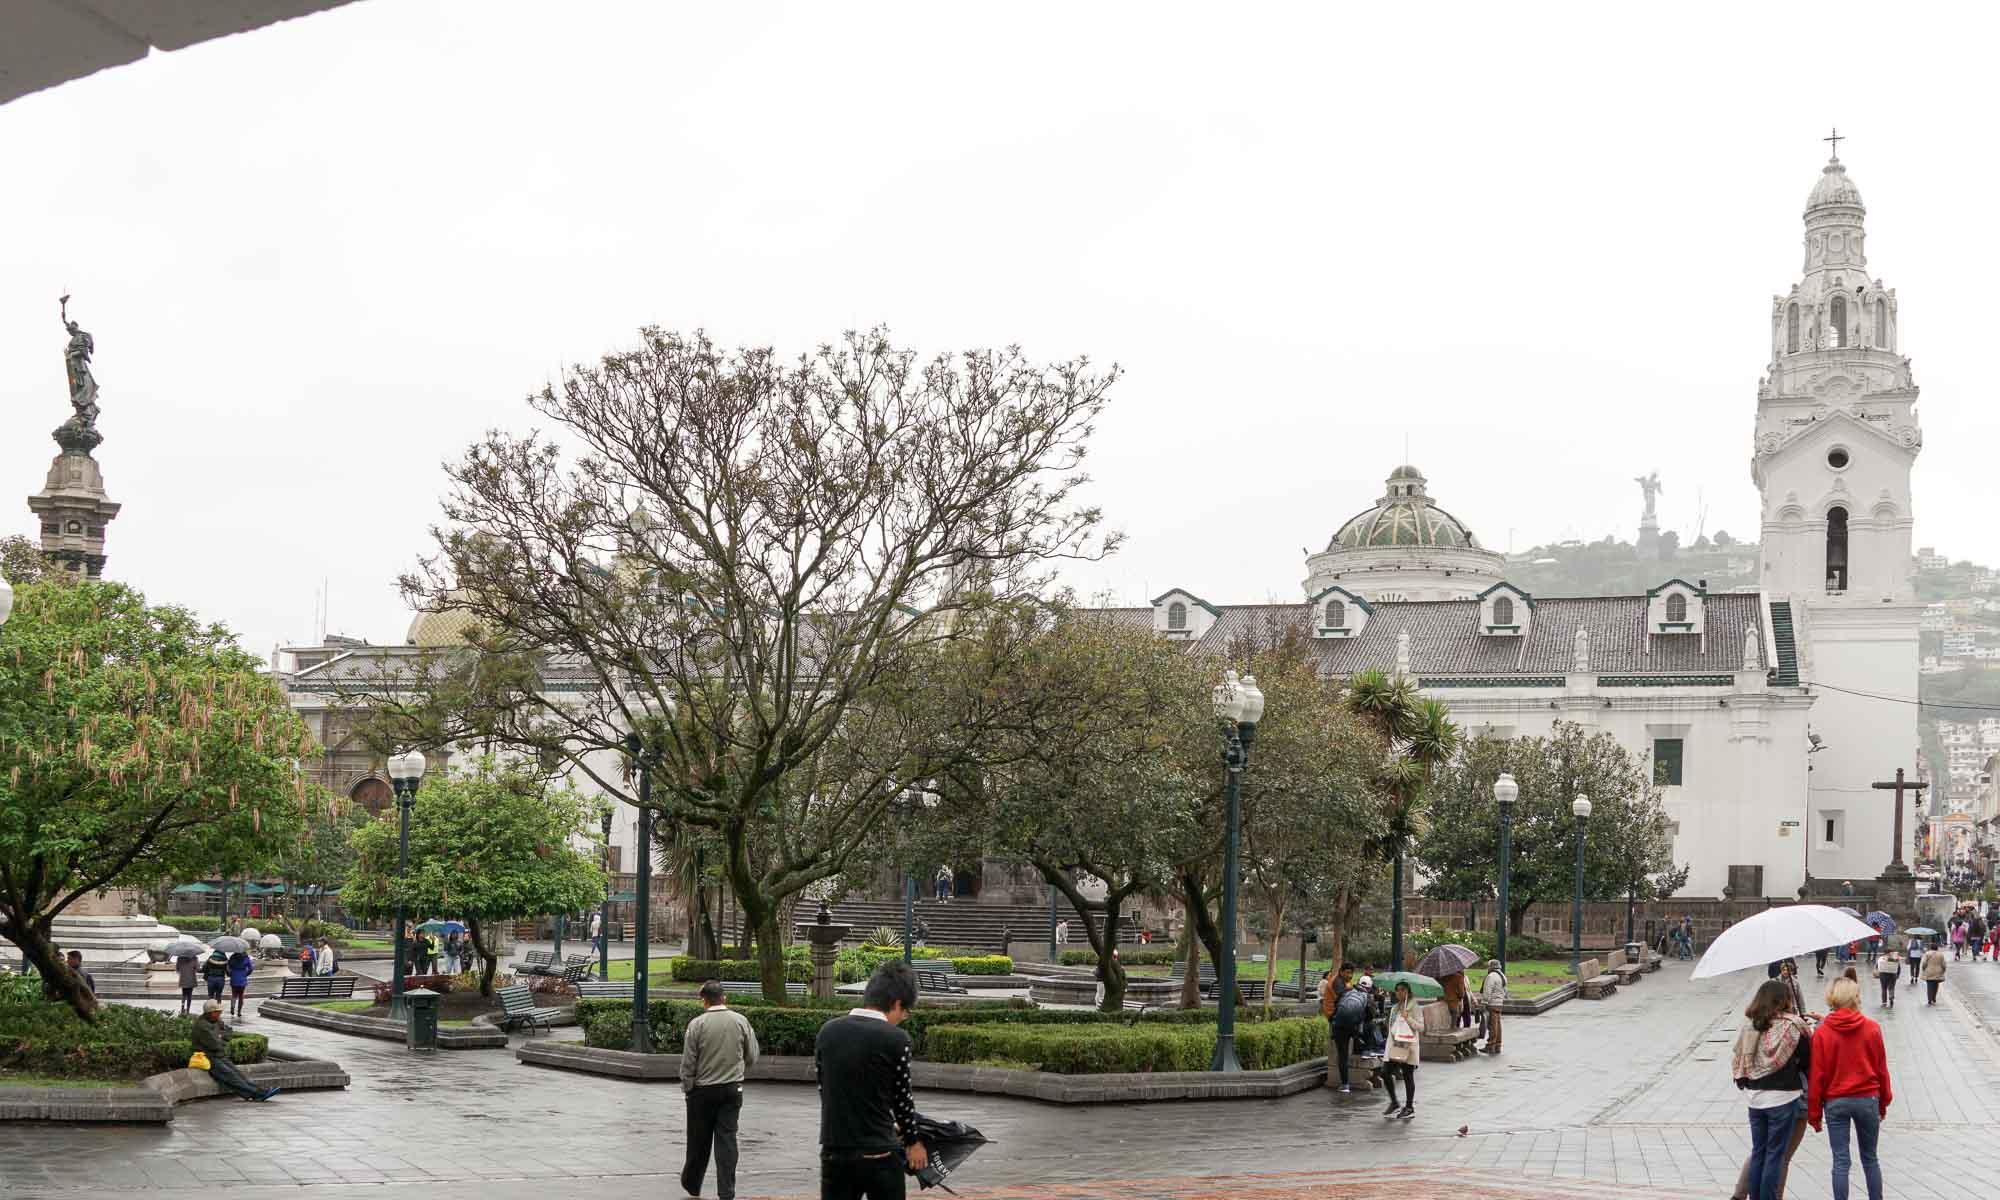 Plaza Grande with the Catedral Metropolitana de Quito